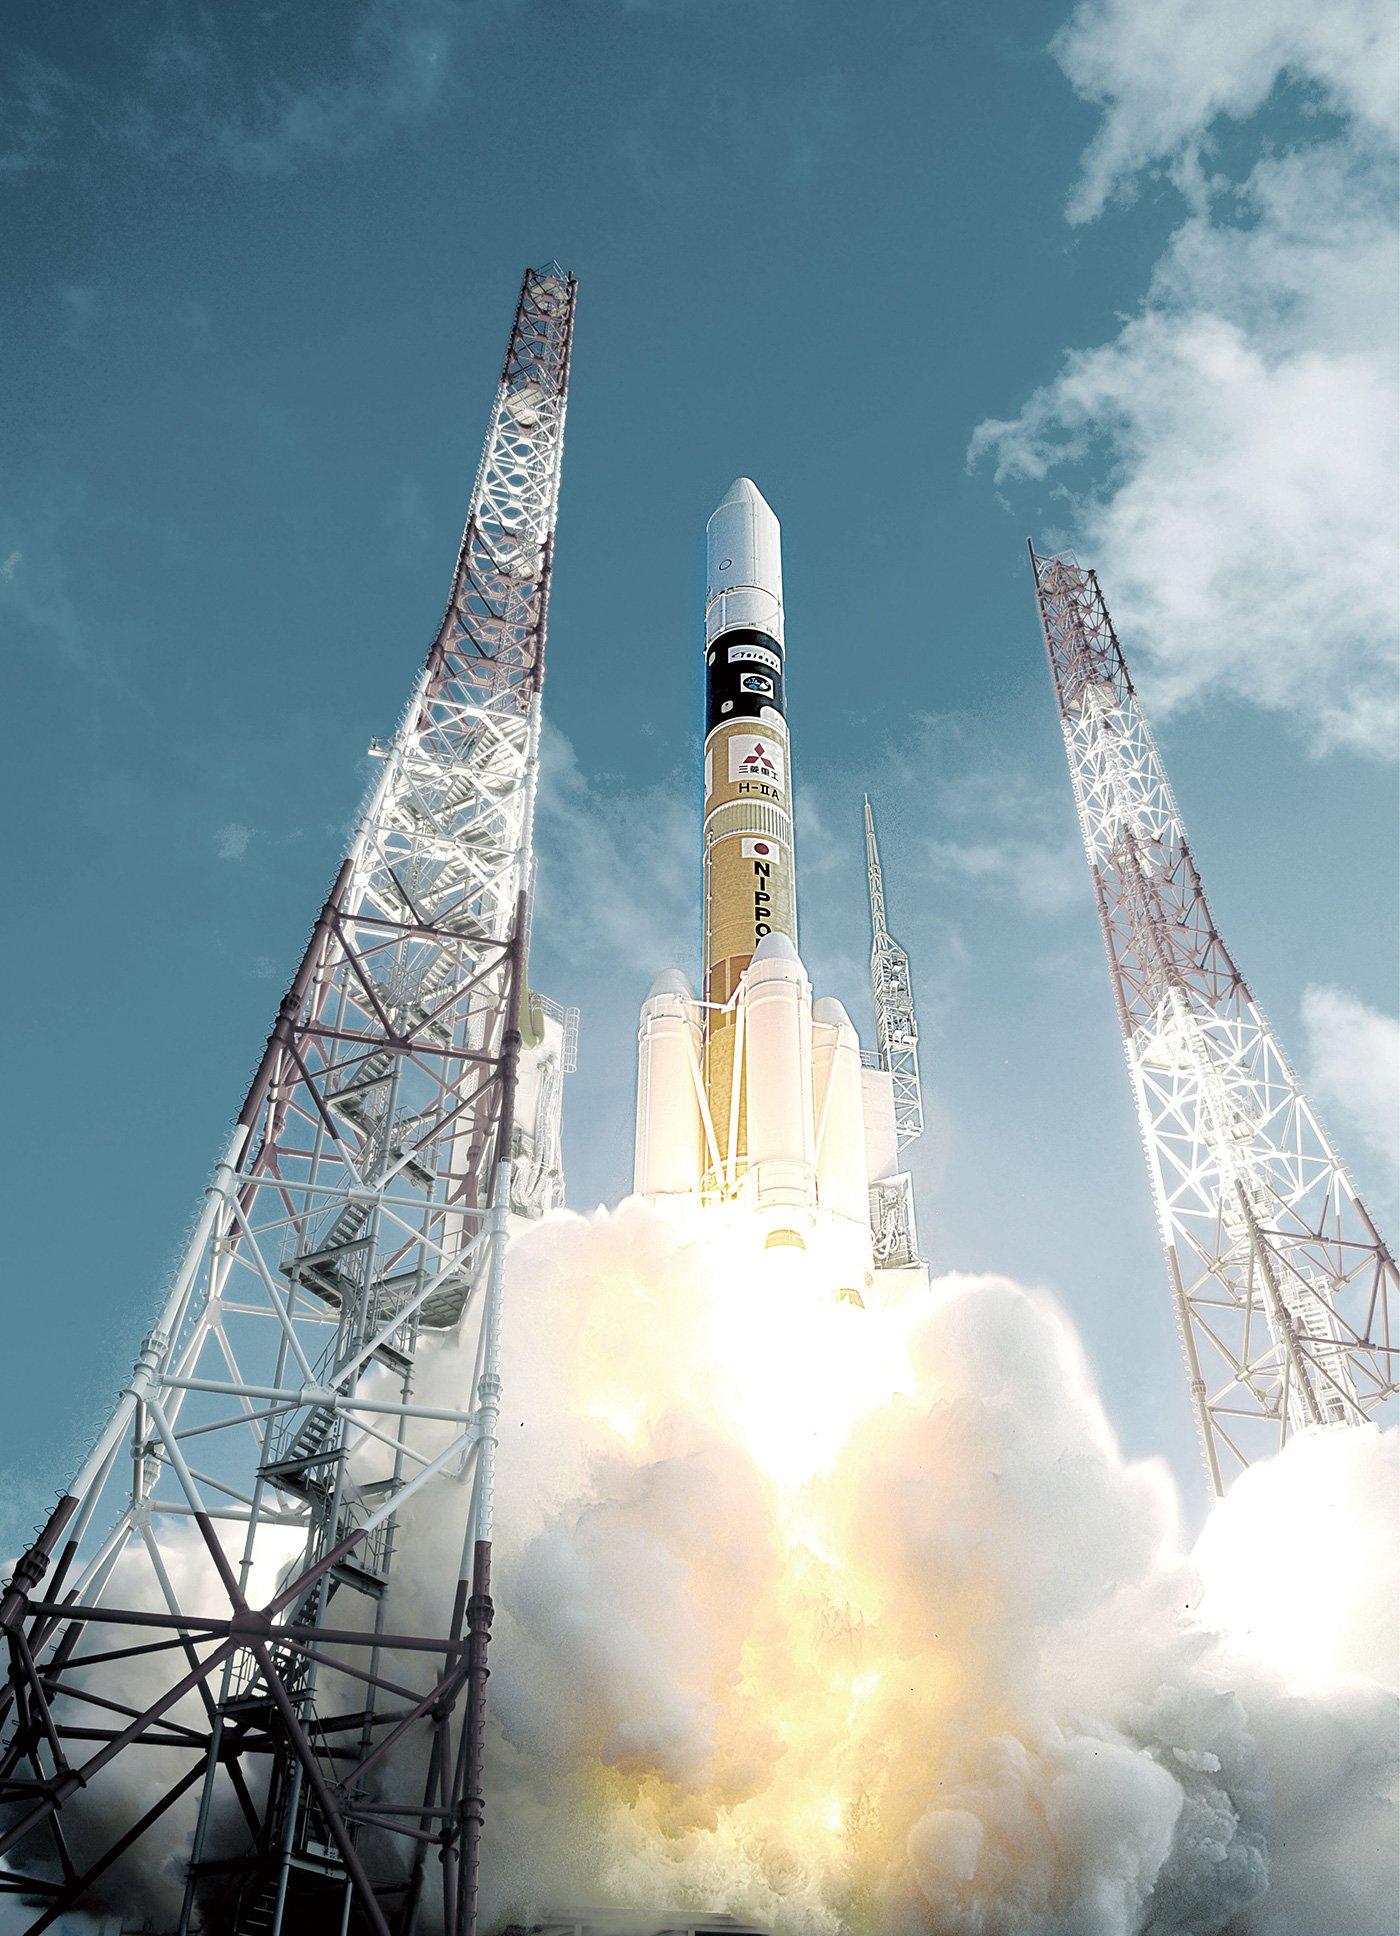 MHI-group-launch-vehicle